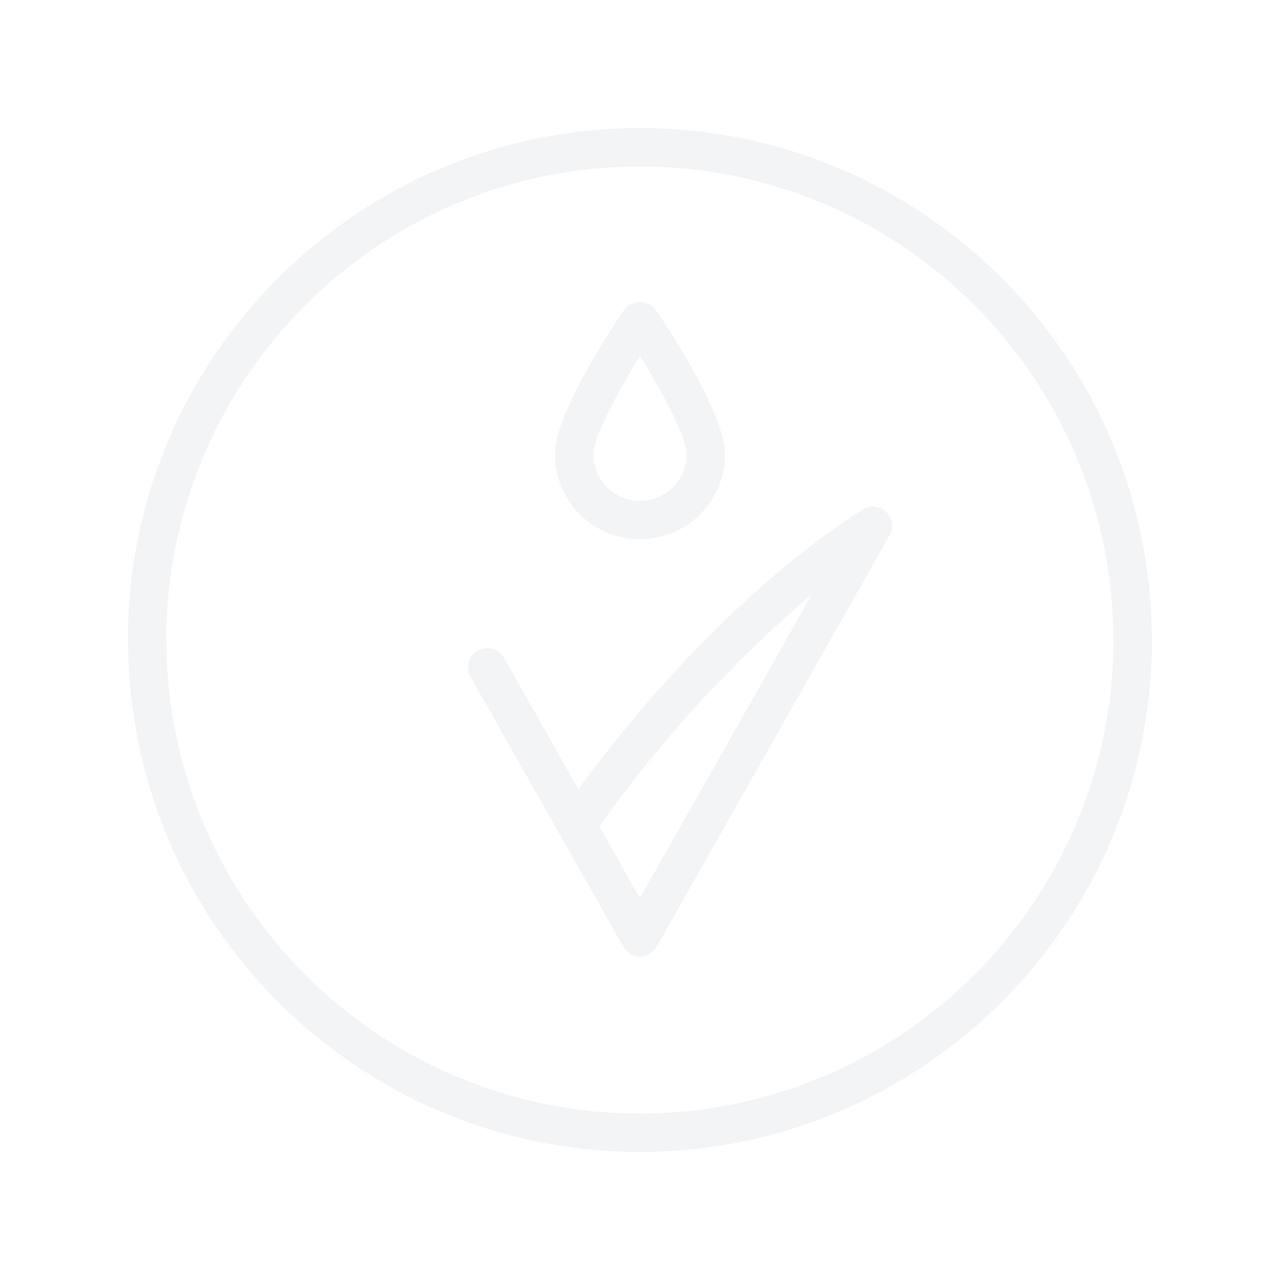 D´DIFFERENCE Natural Beauty 4D Moisturizing Eye Cream 15ml